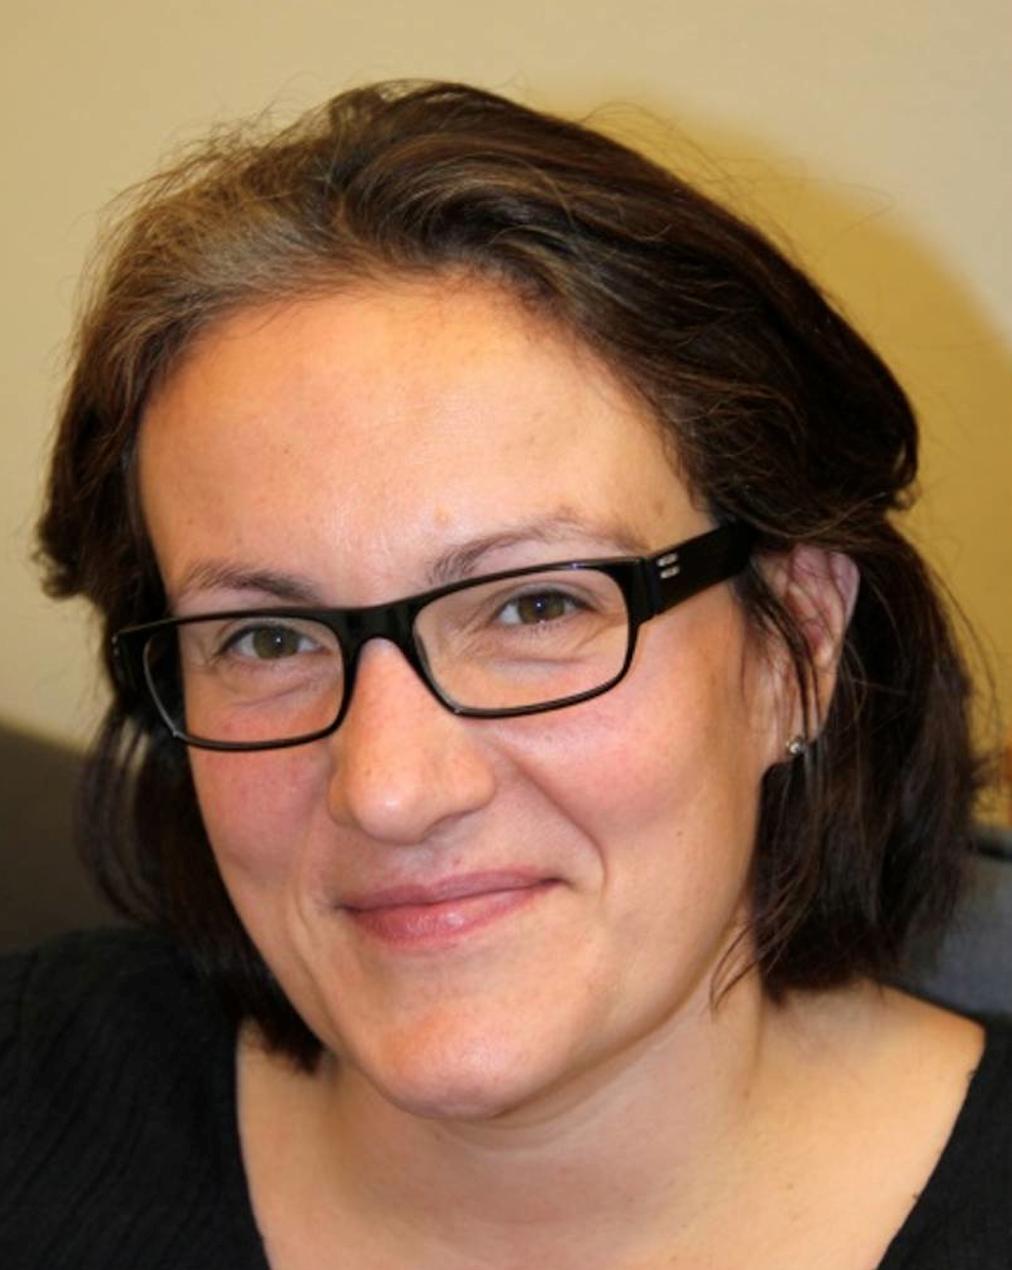 Christelle Prinz